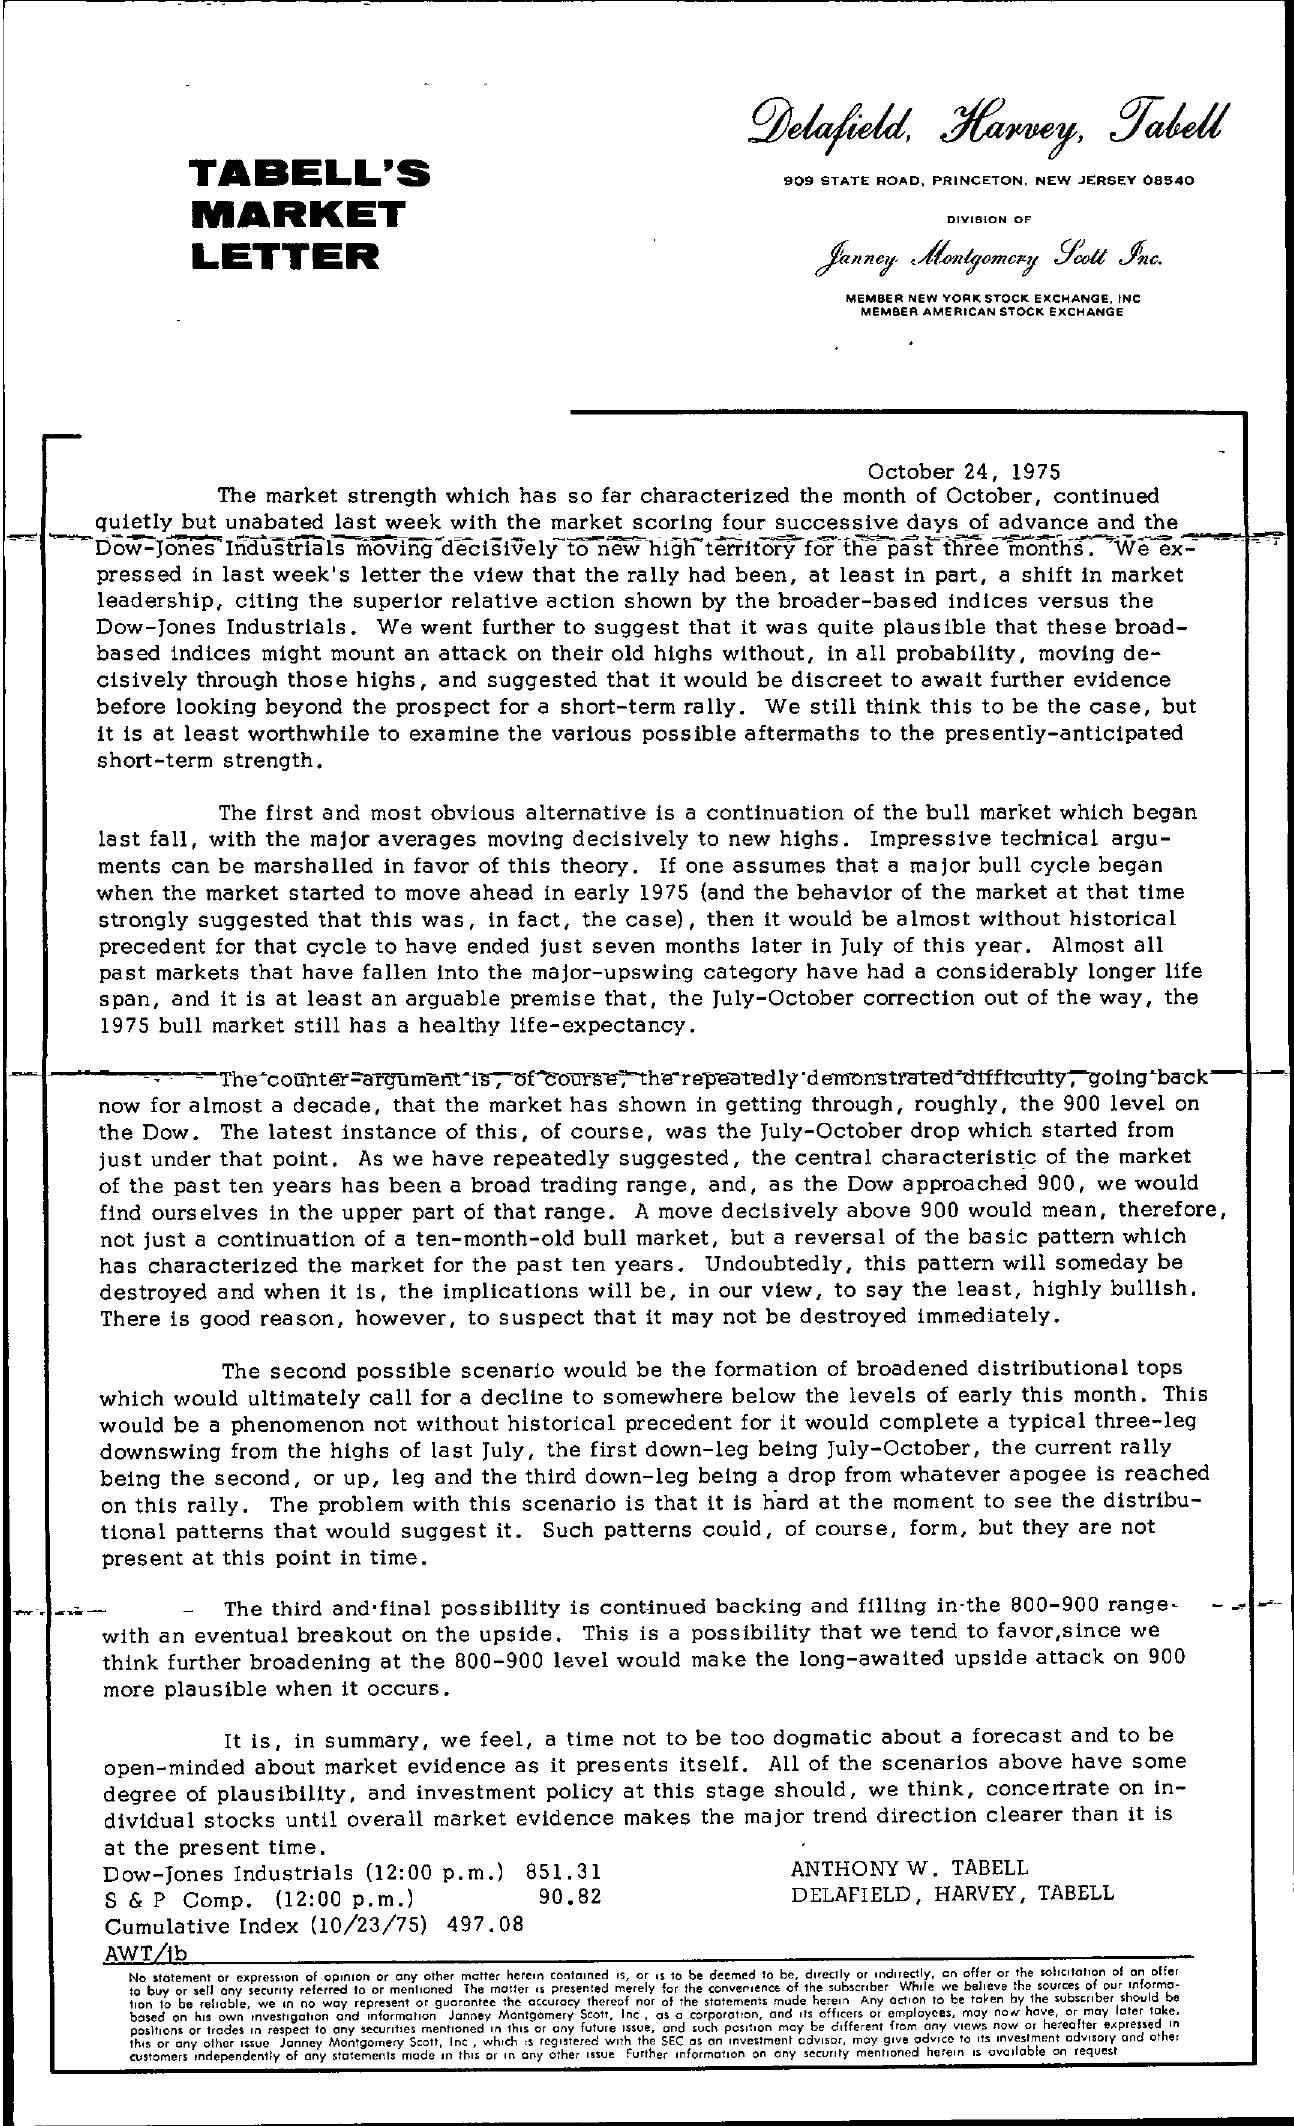 Tabell's Market Letter - October 24, 1975